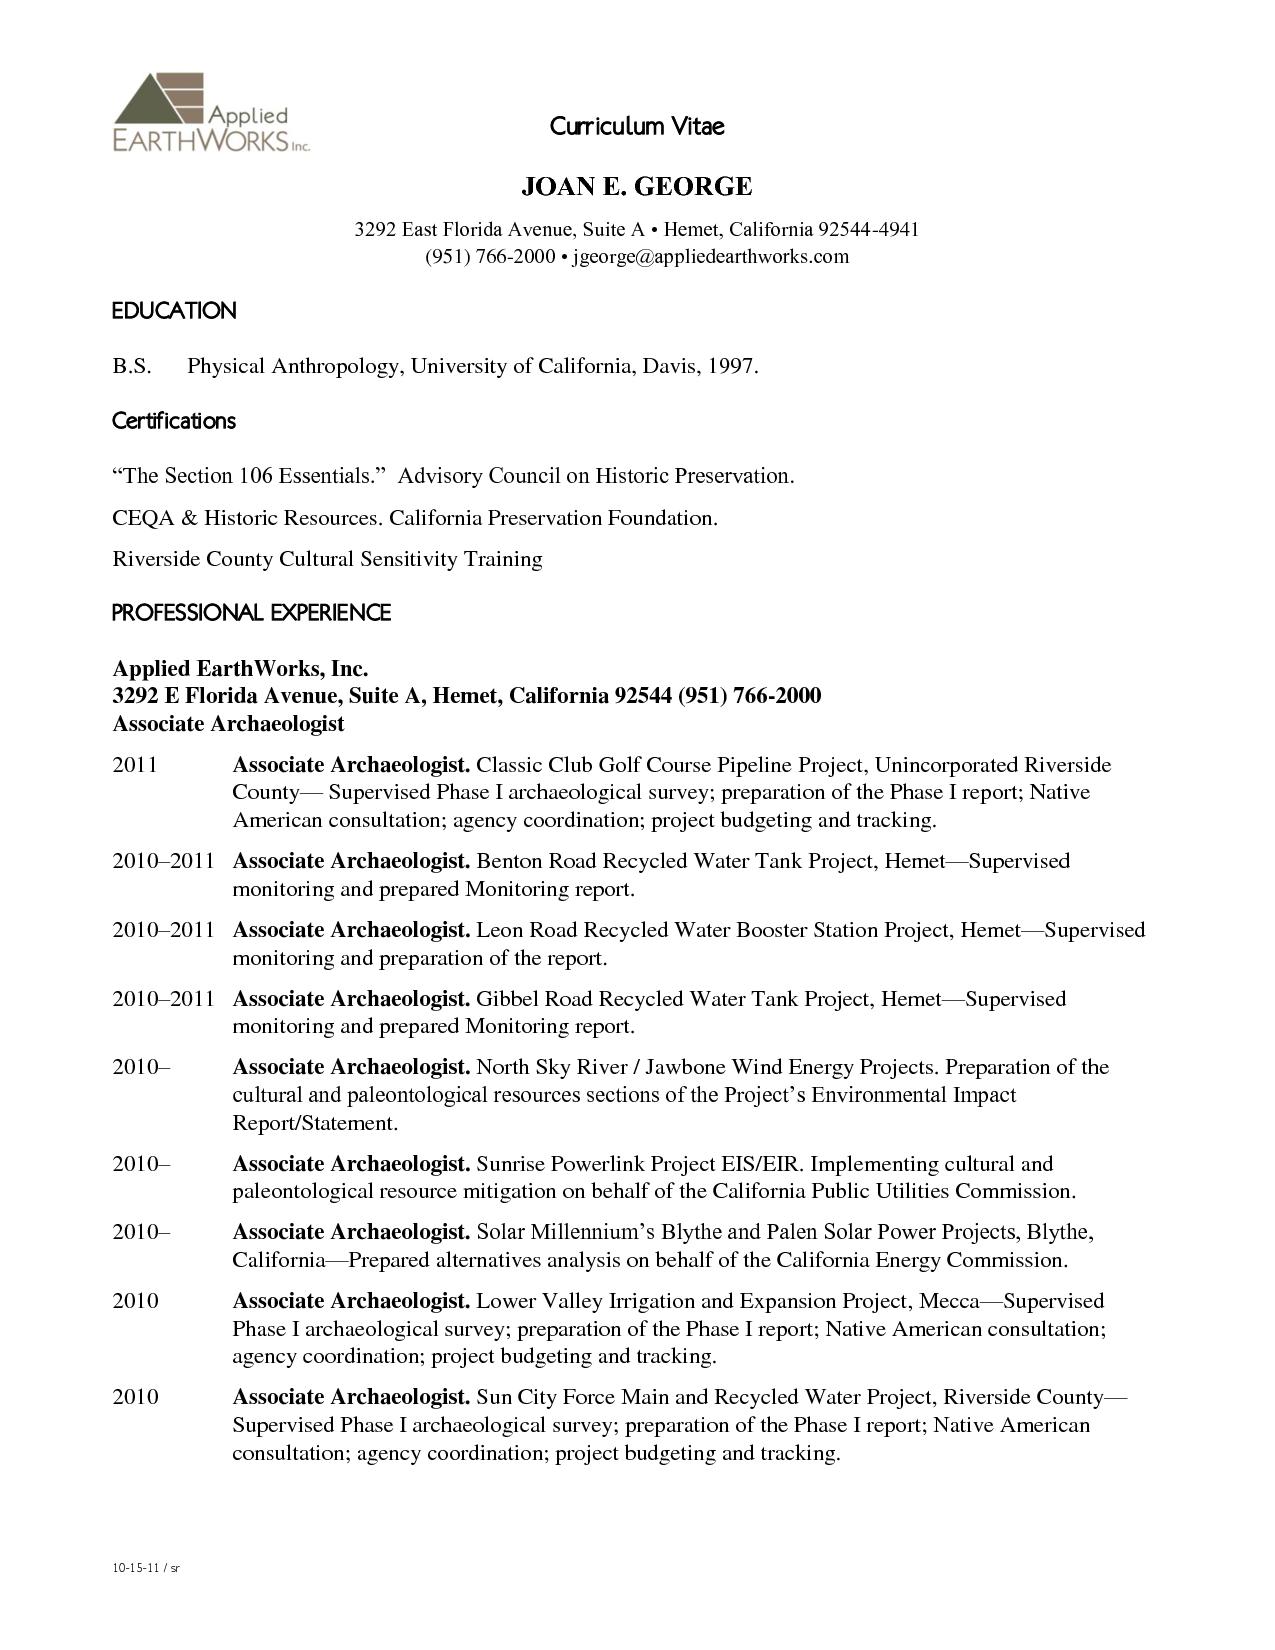 free medical assistant resume downloads